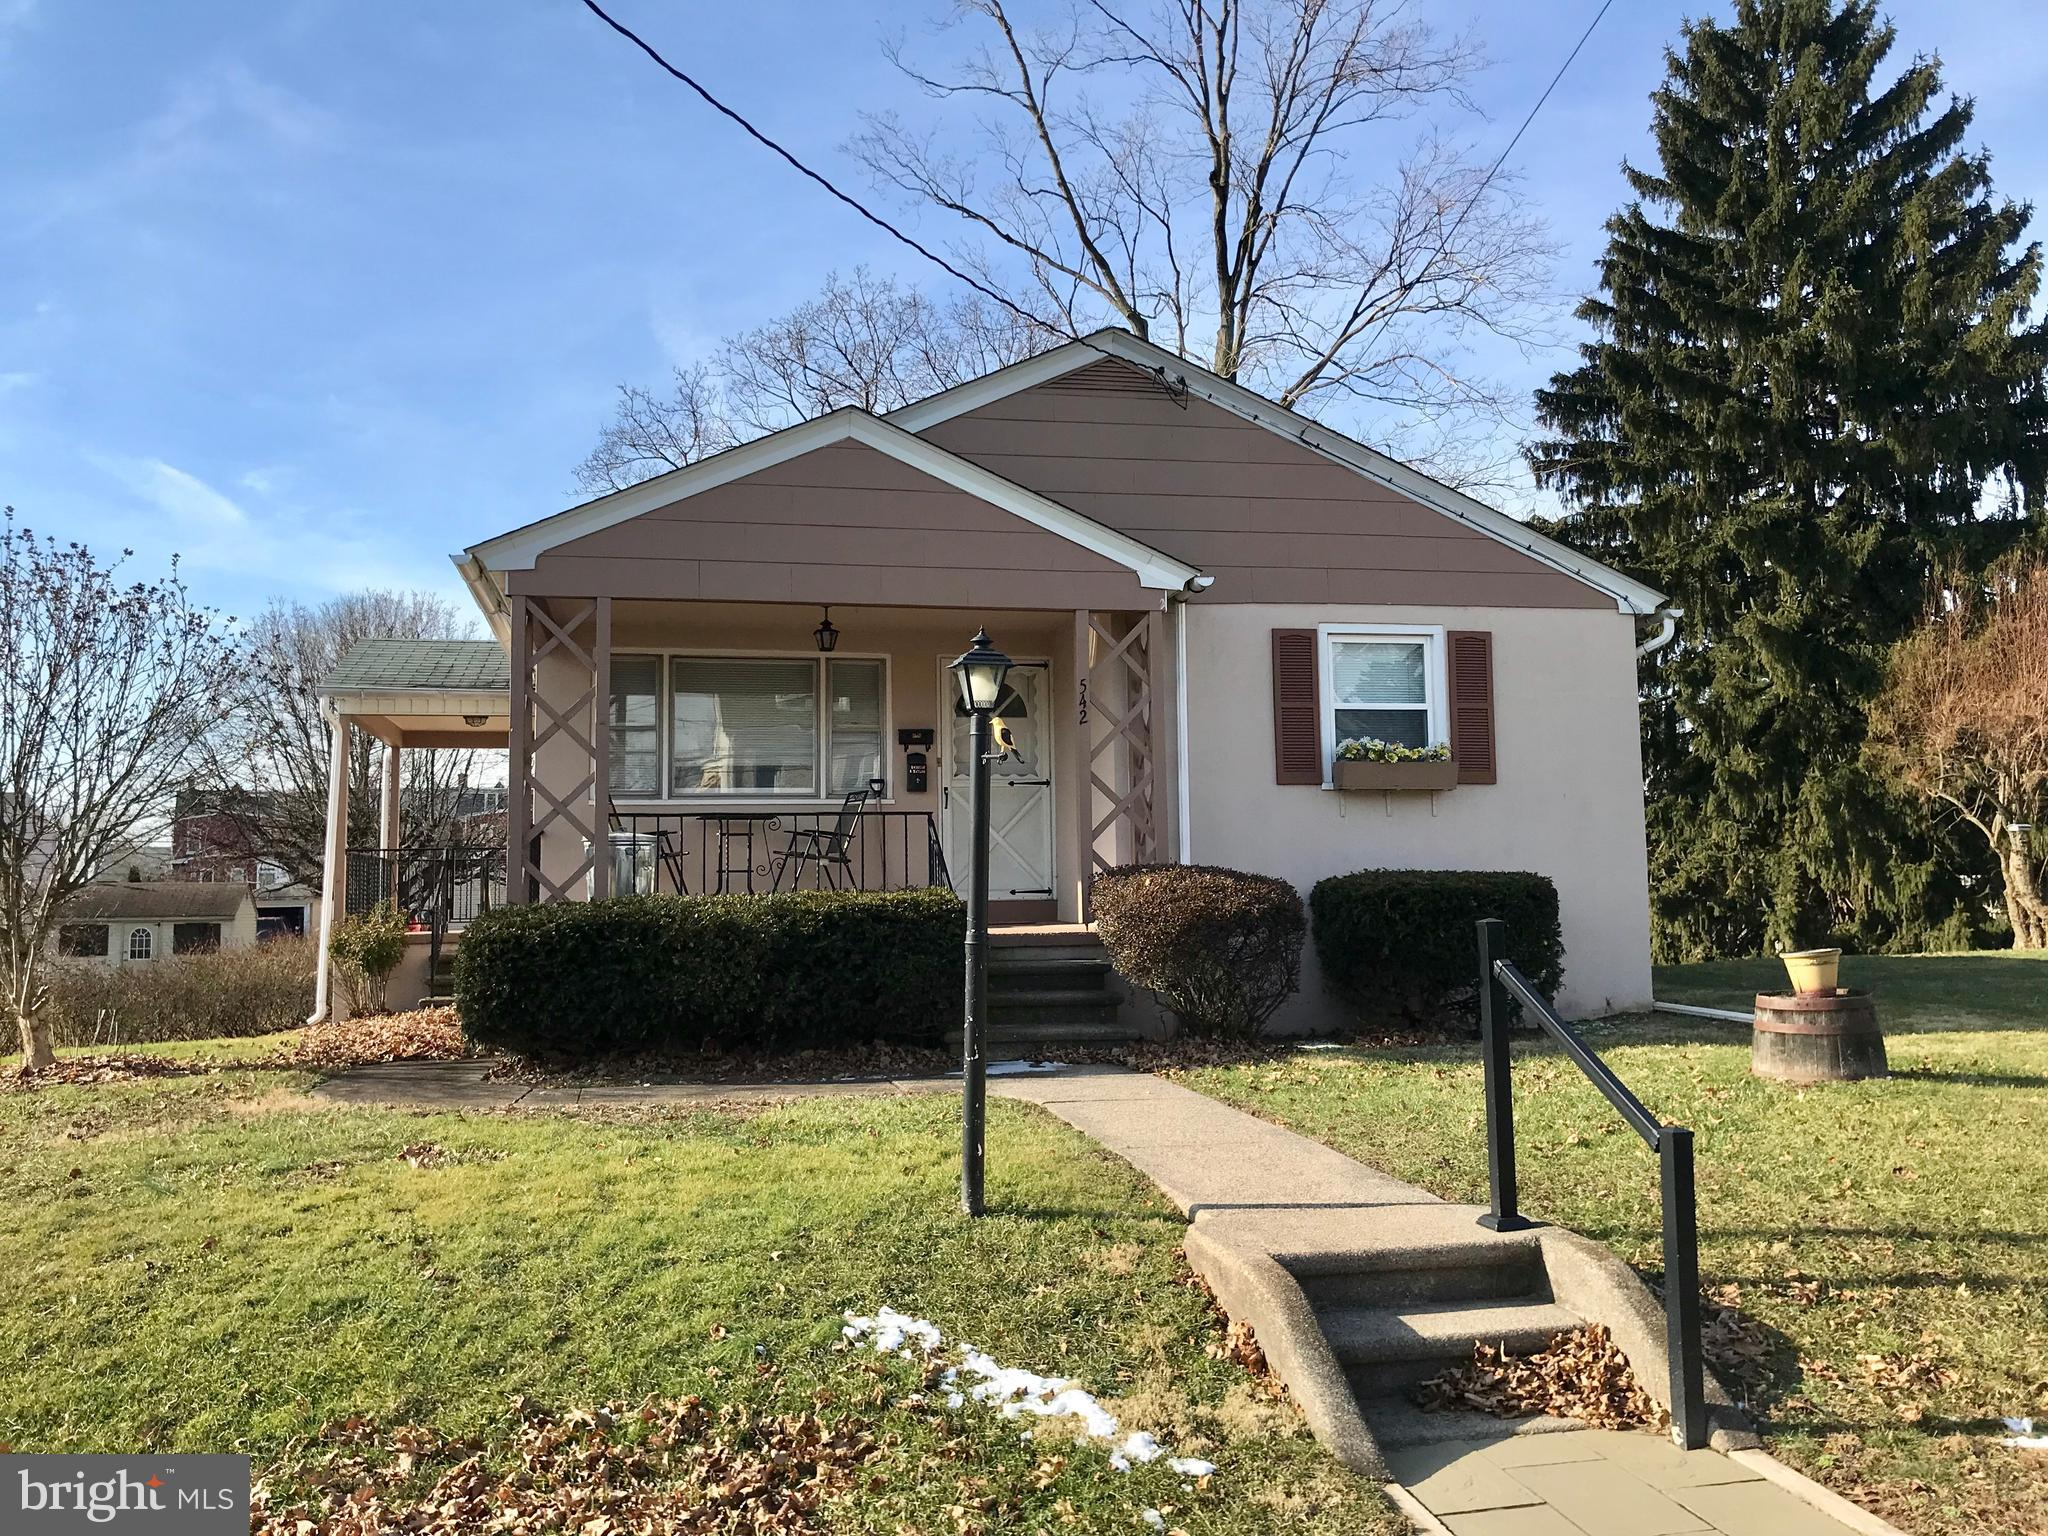 542 WASHINGTON STREET, EAST GREENVILLE, PA 18041